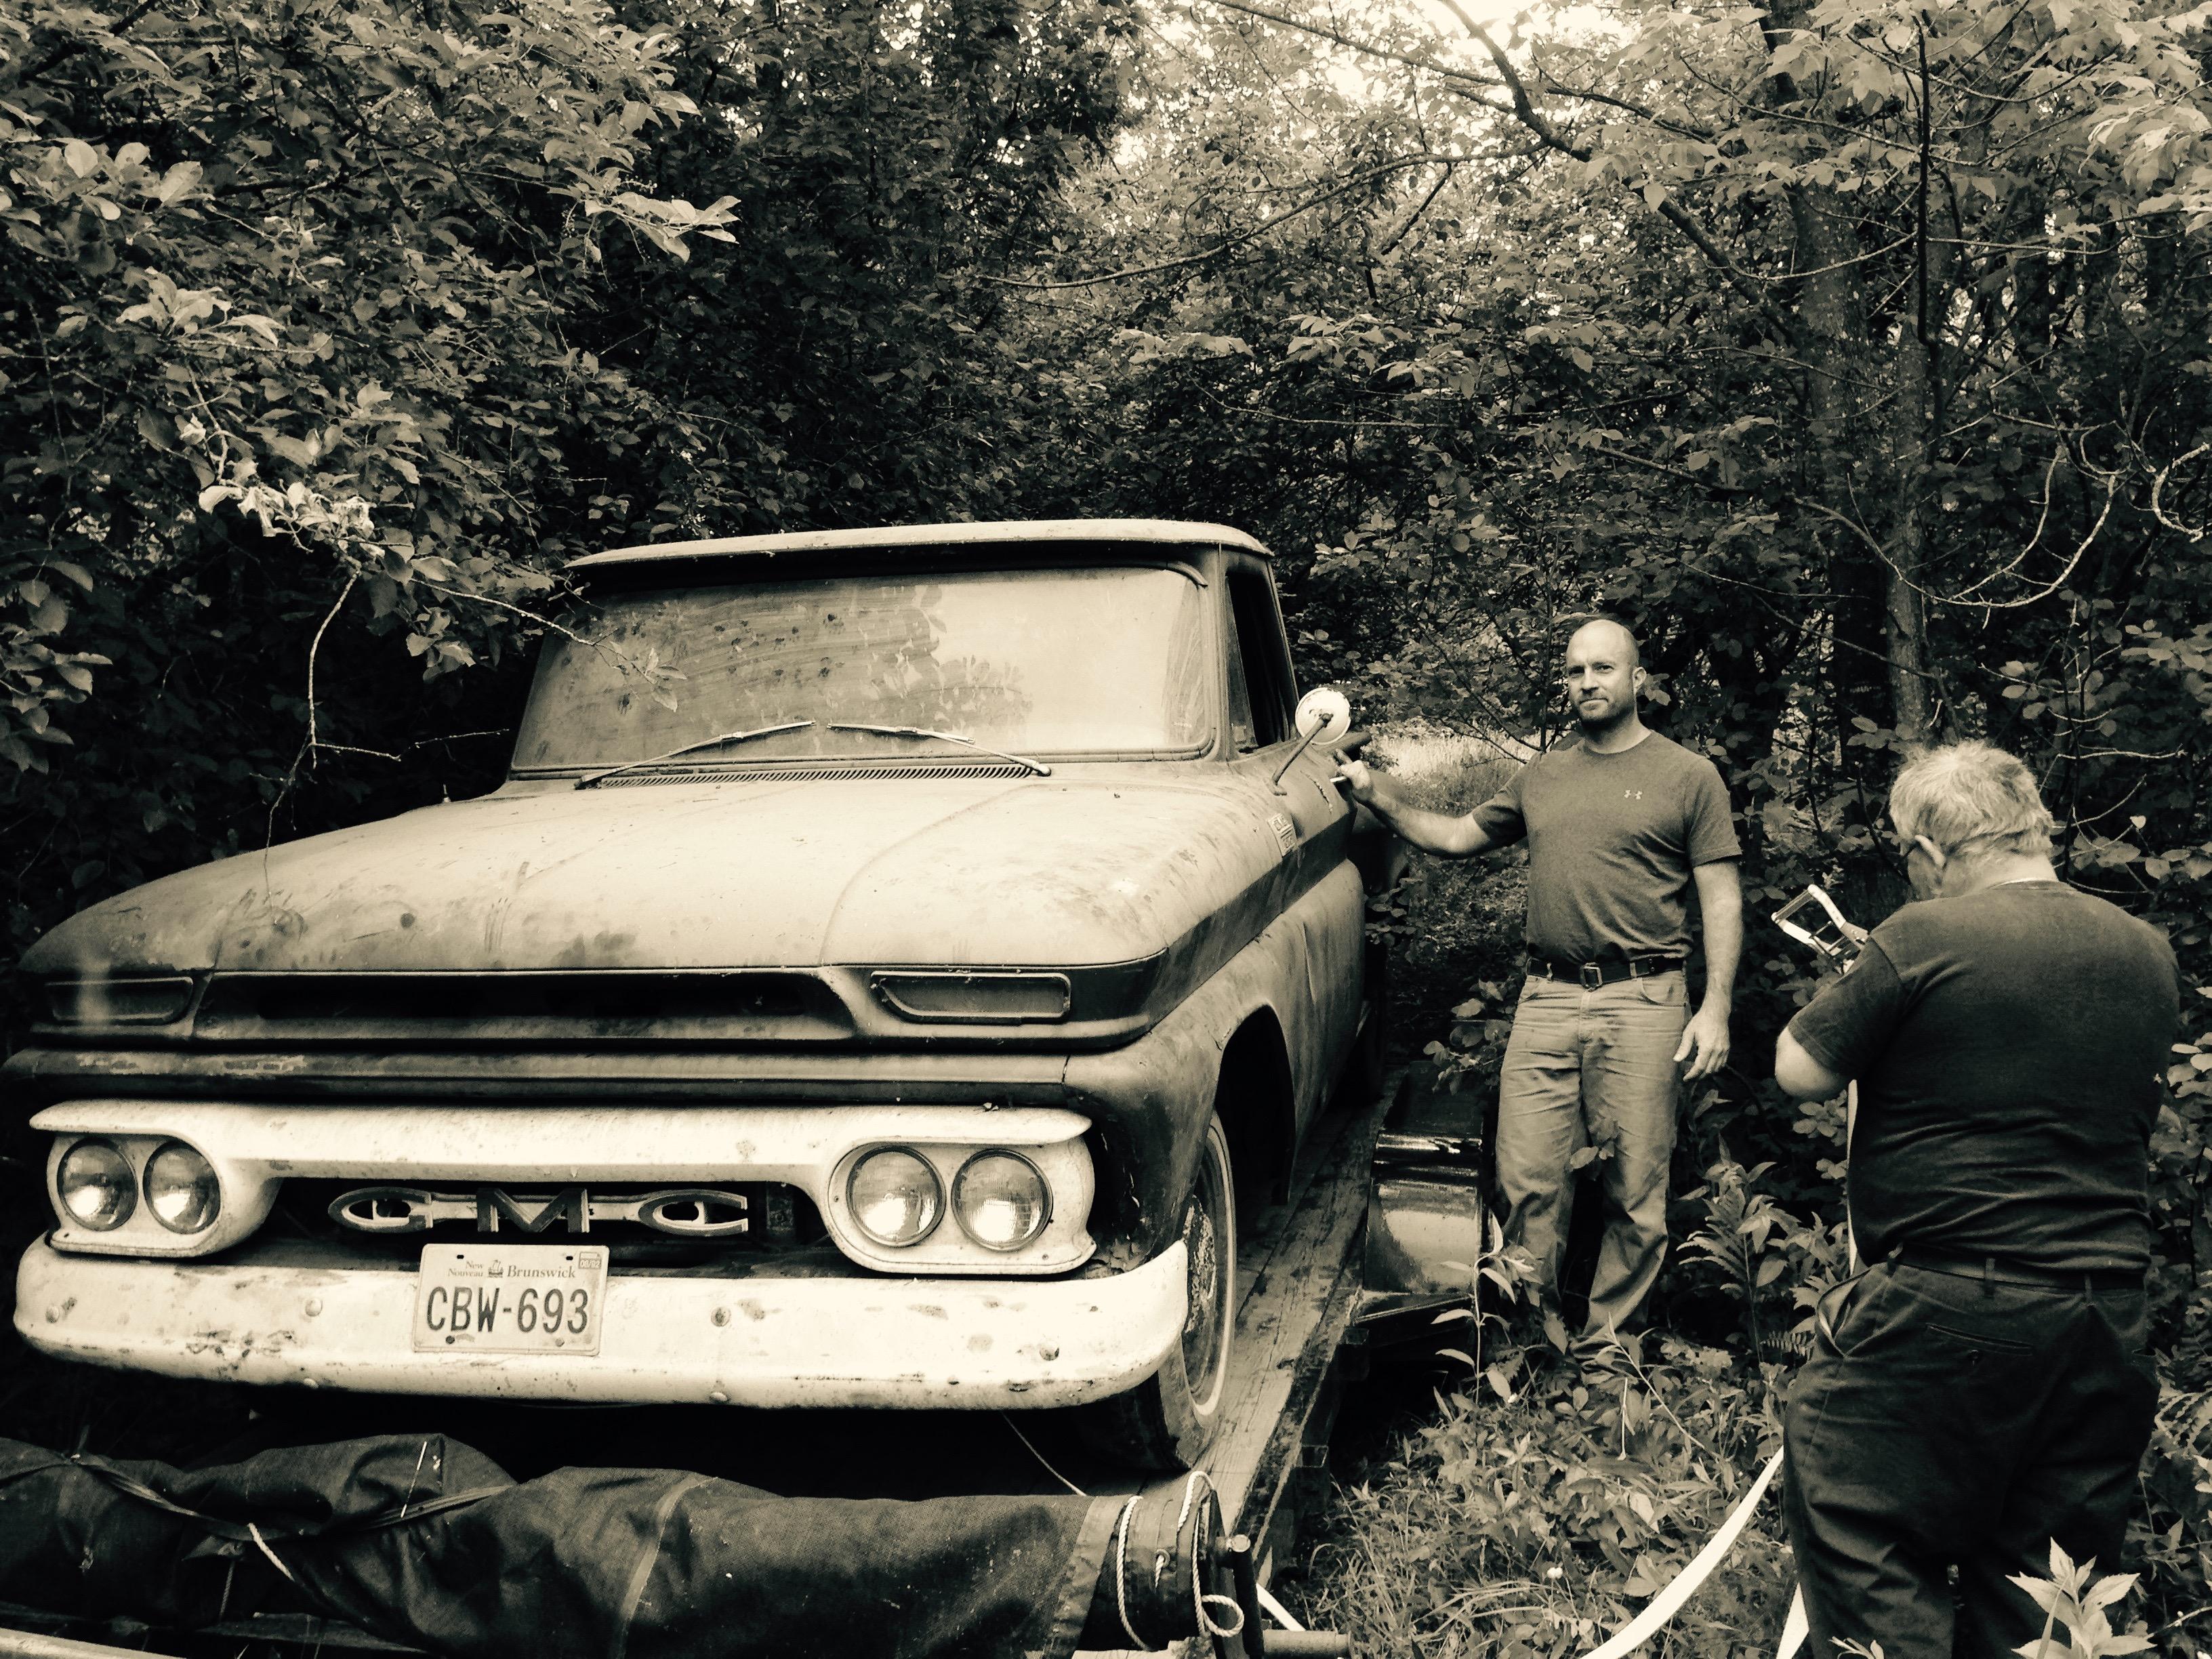 Hugh Mackay, with pre-restored truck